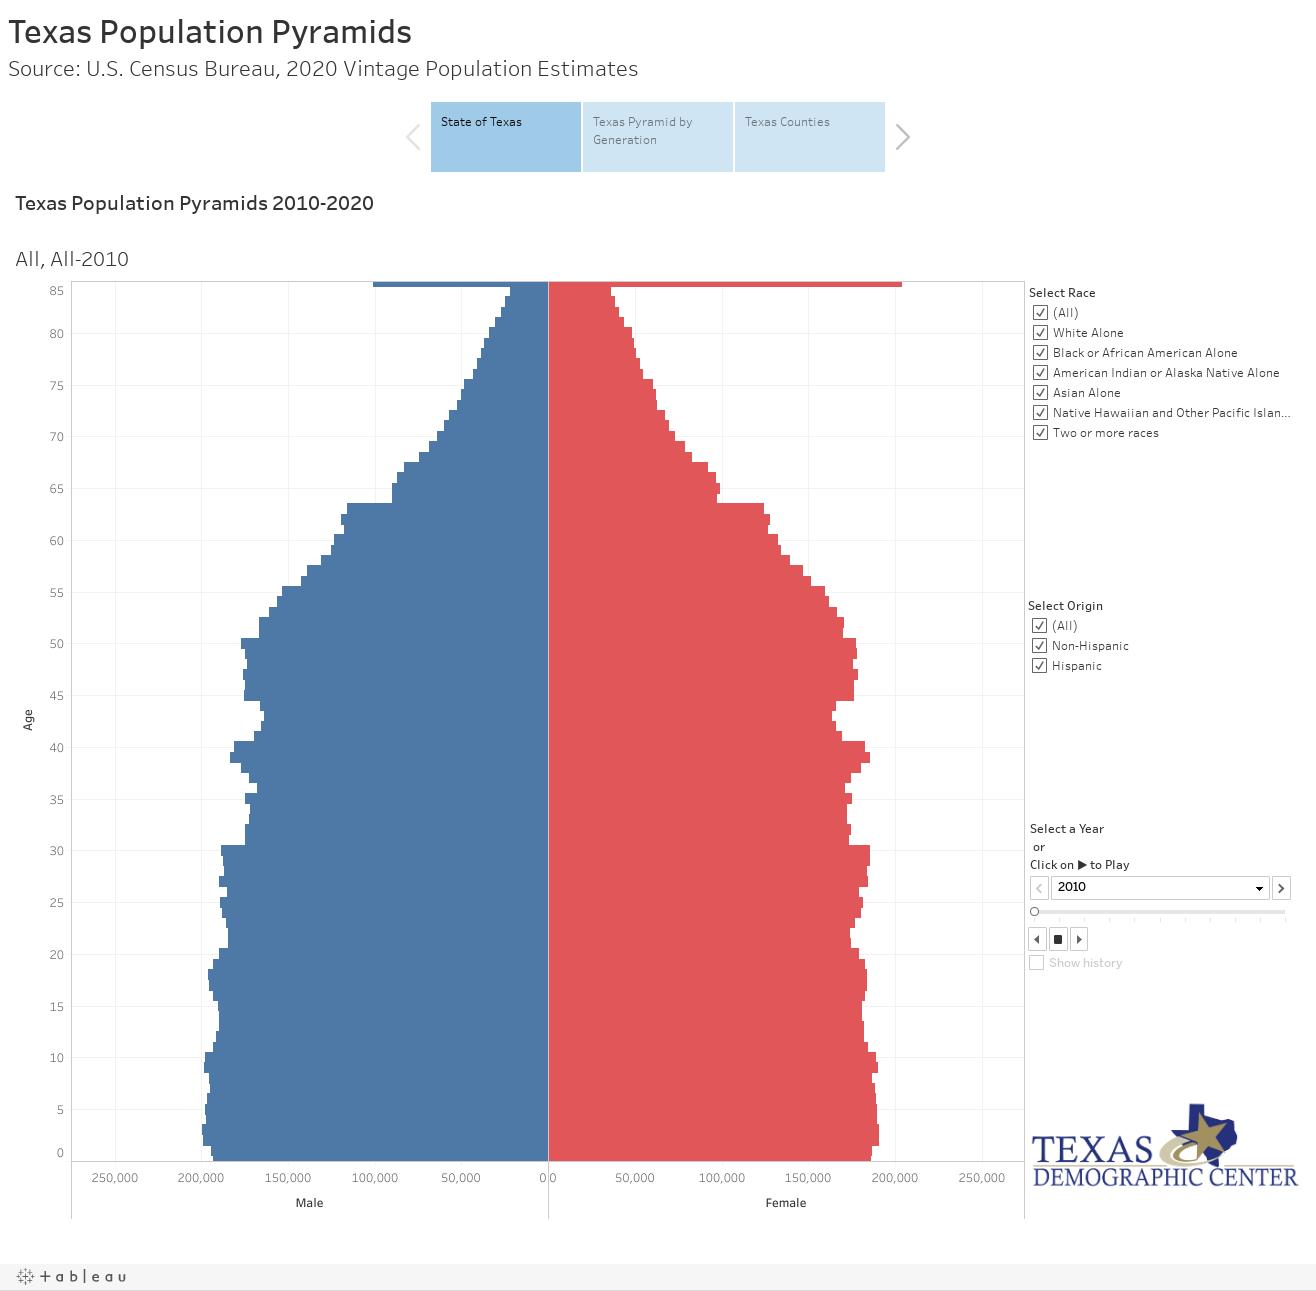 Texas Population Pyramids Source: U.S. Census Bureau, 2020 Vintage Population Estimates